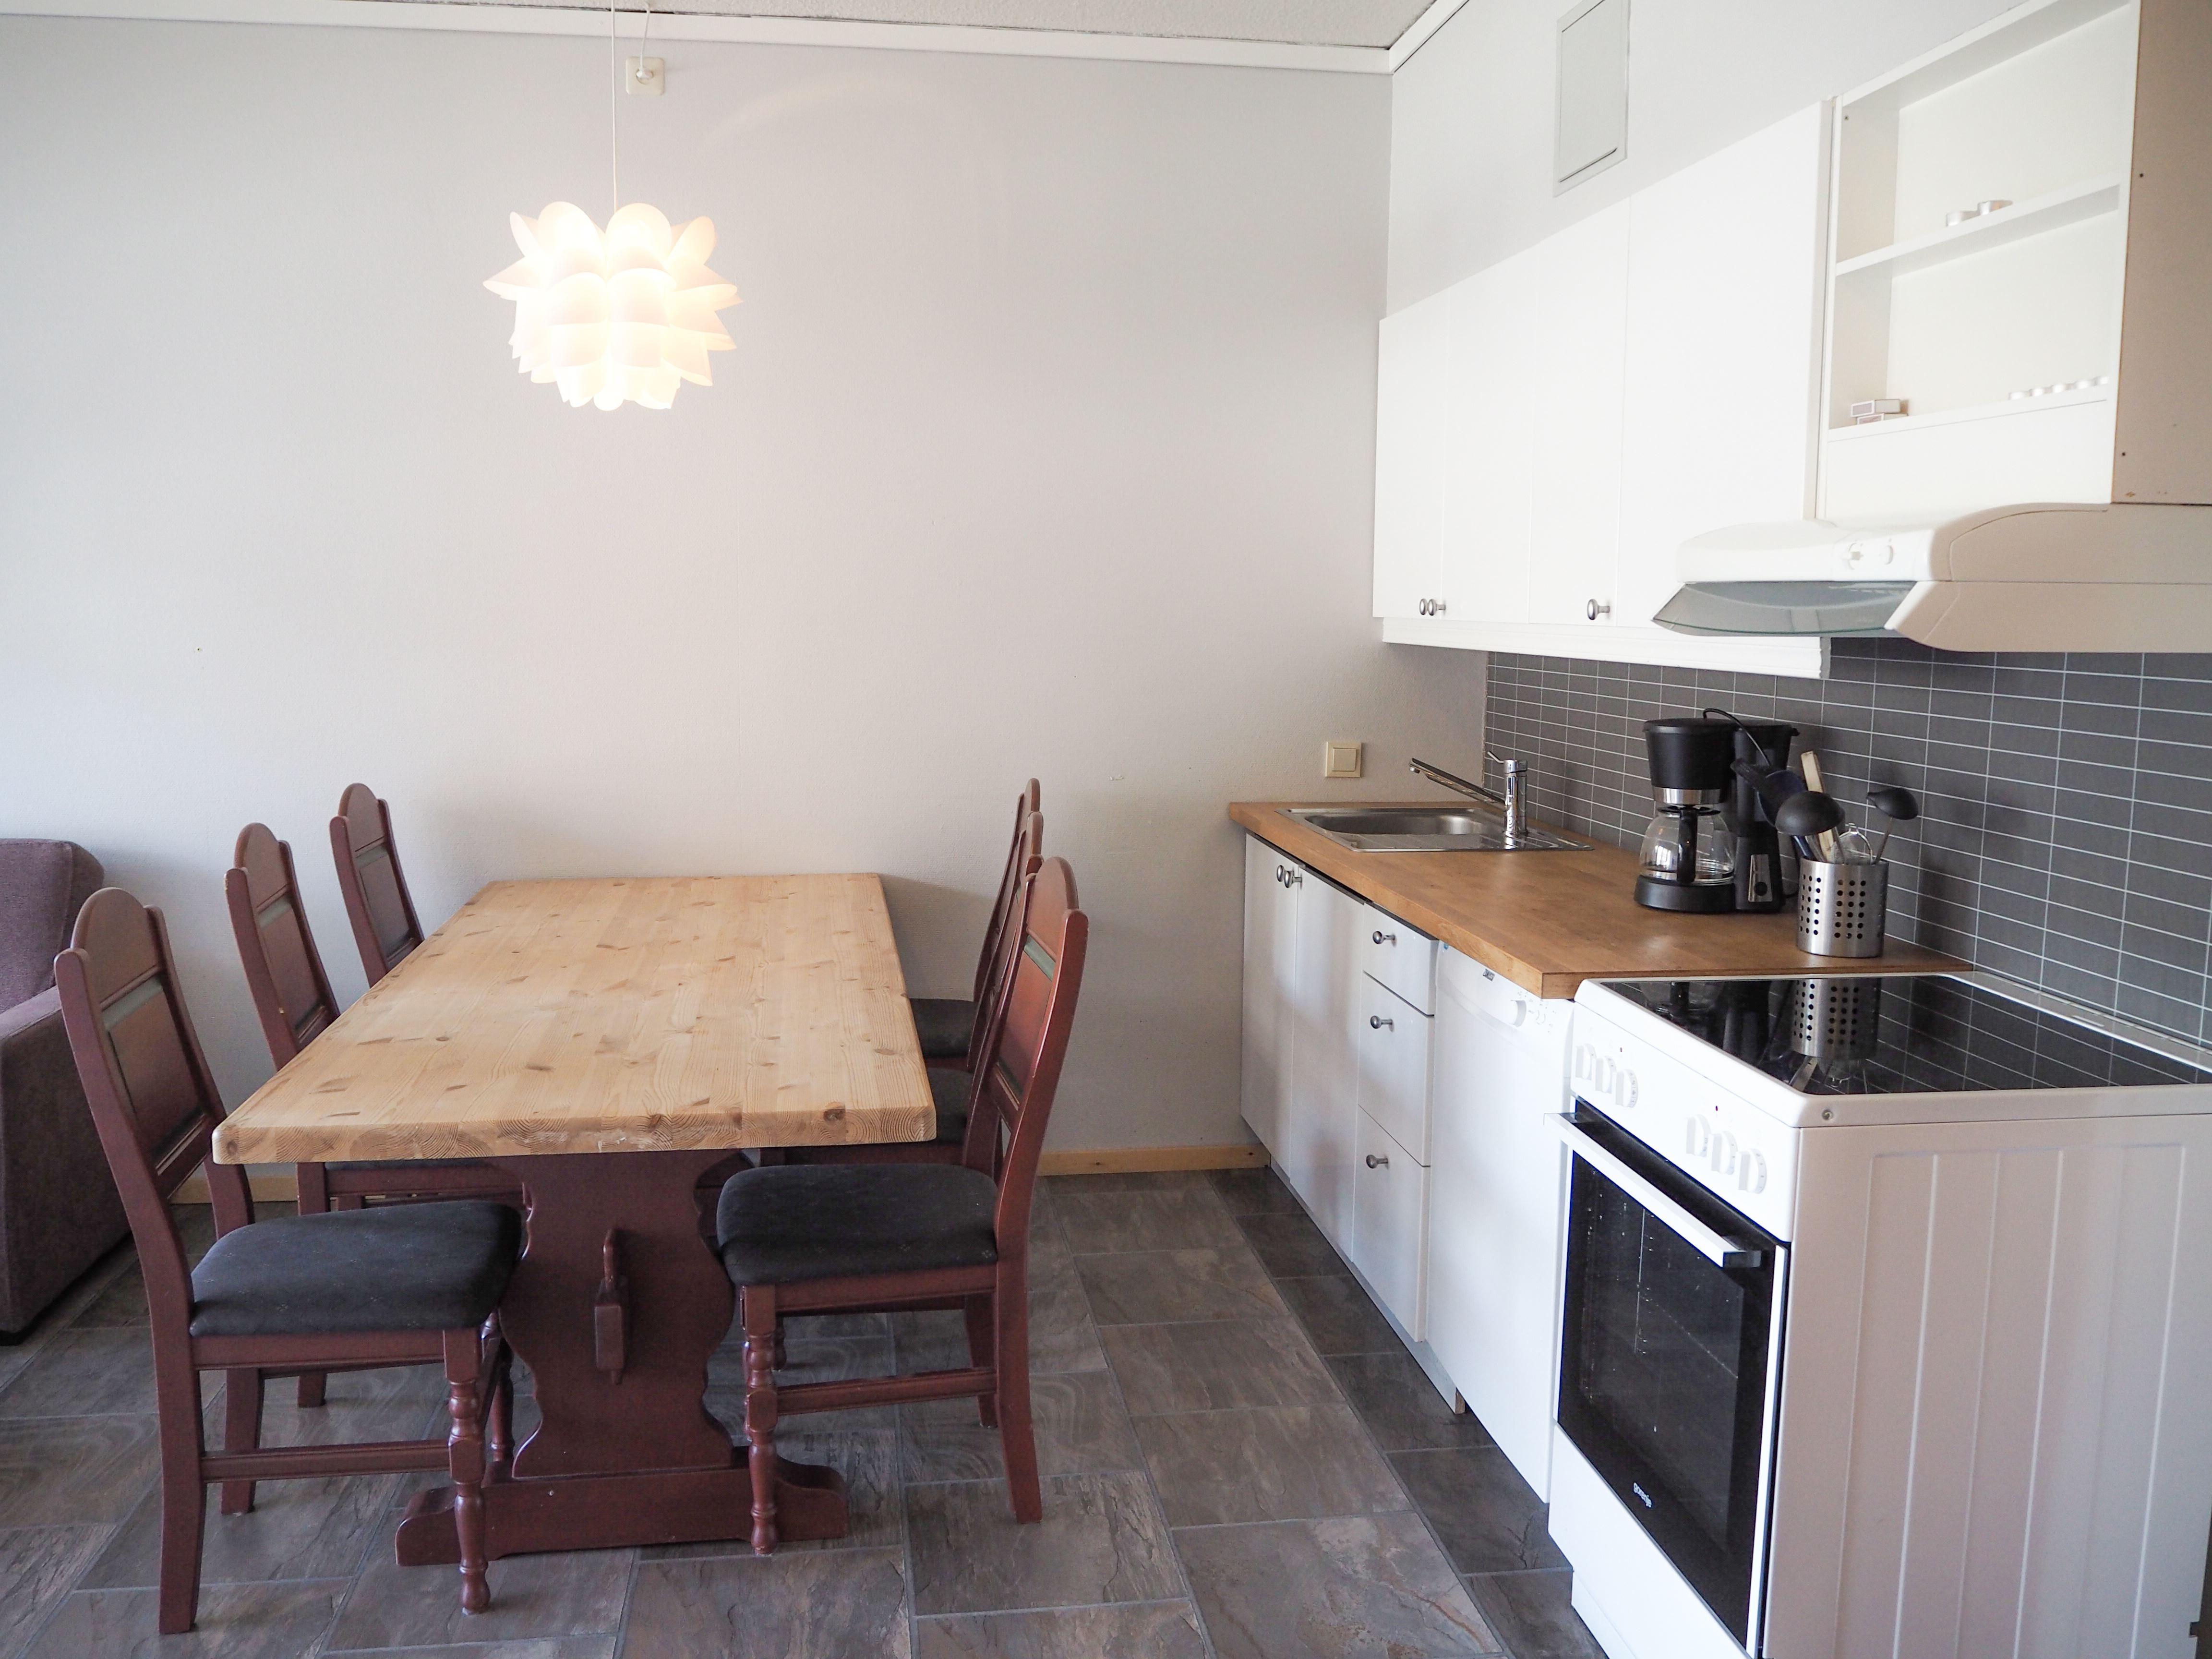 Leilighet 328 / Apartment 328